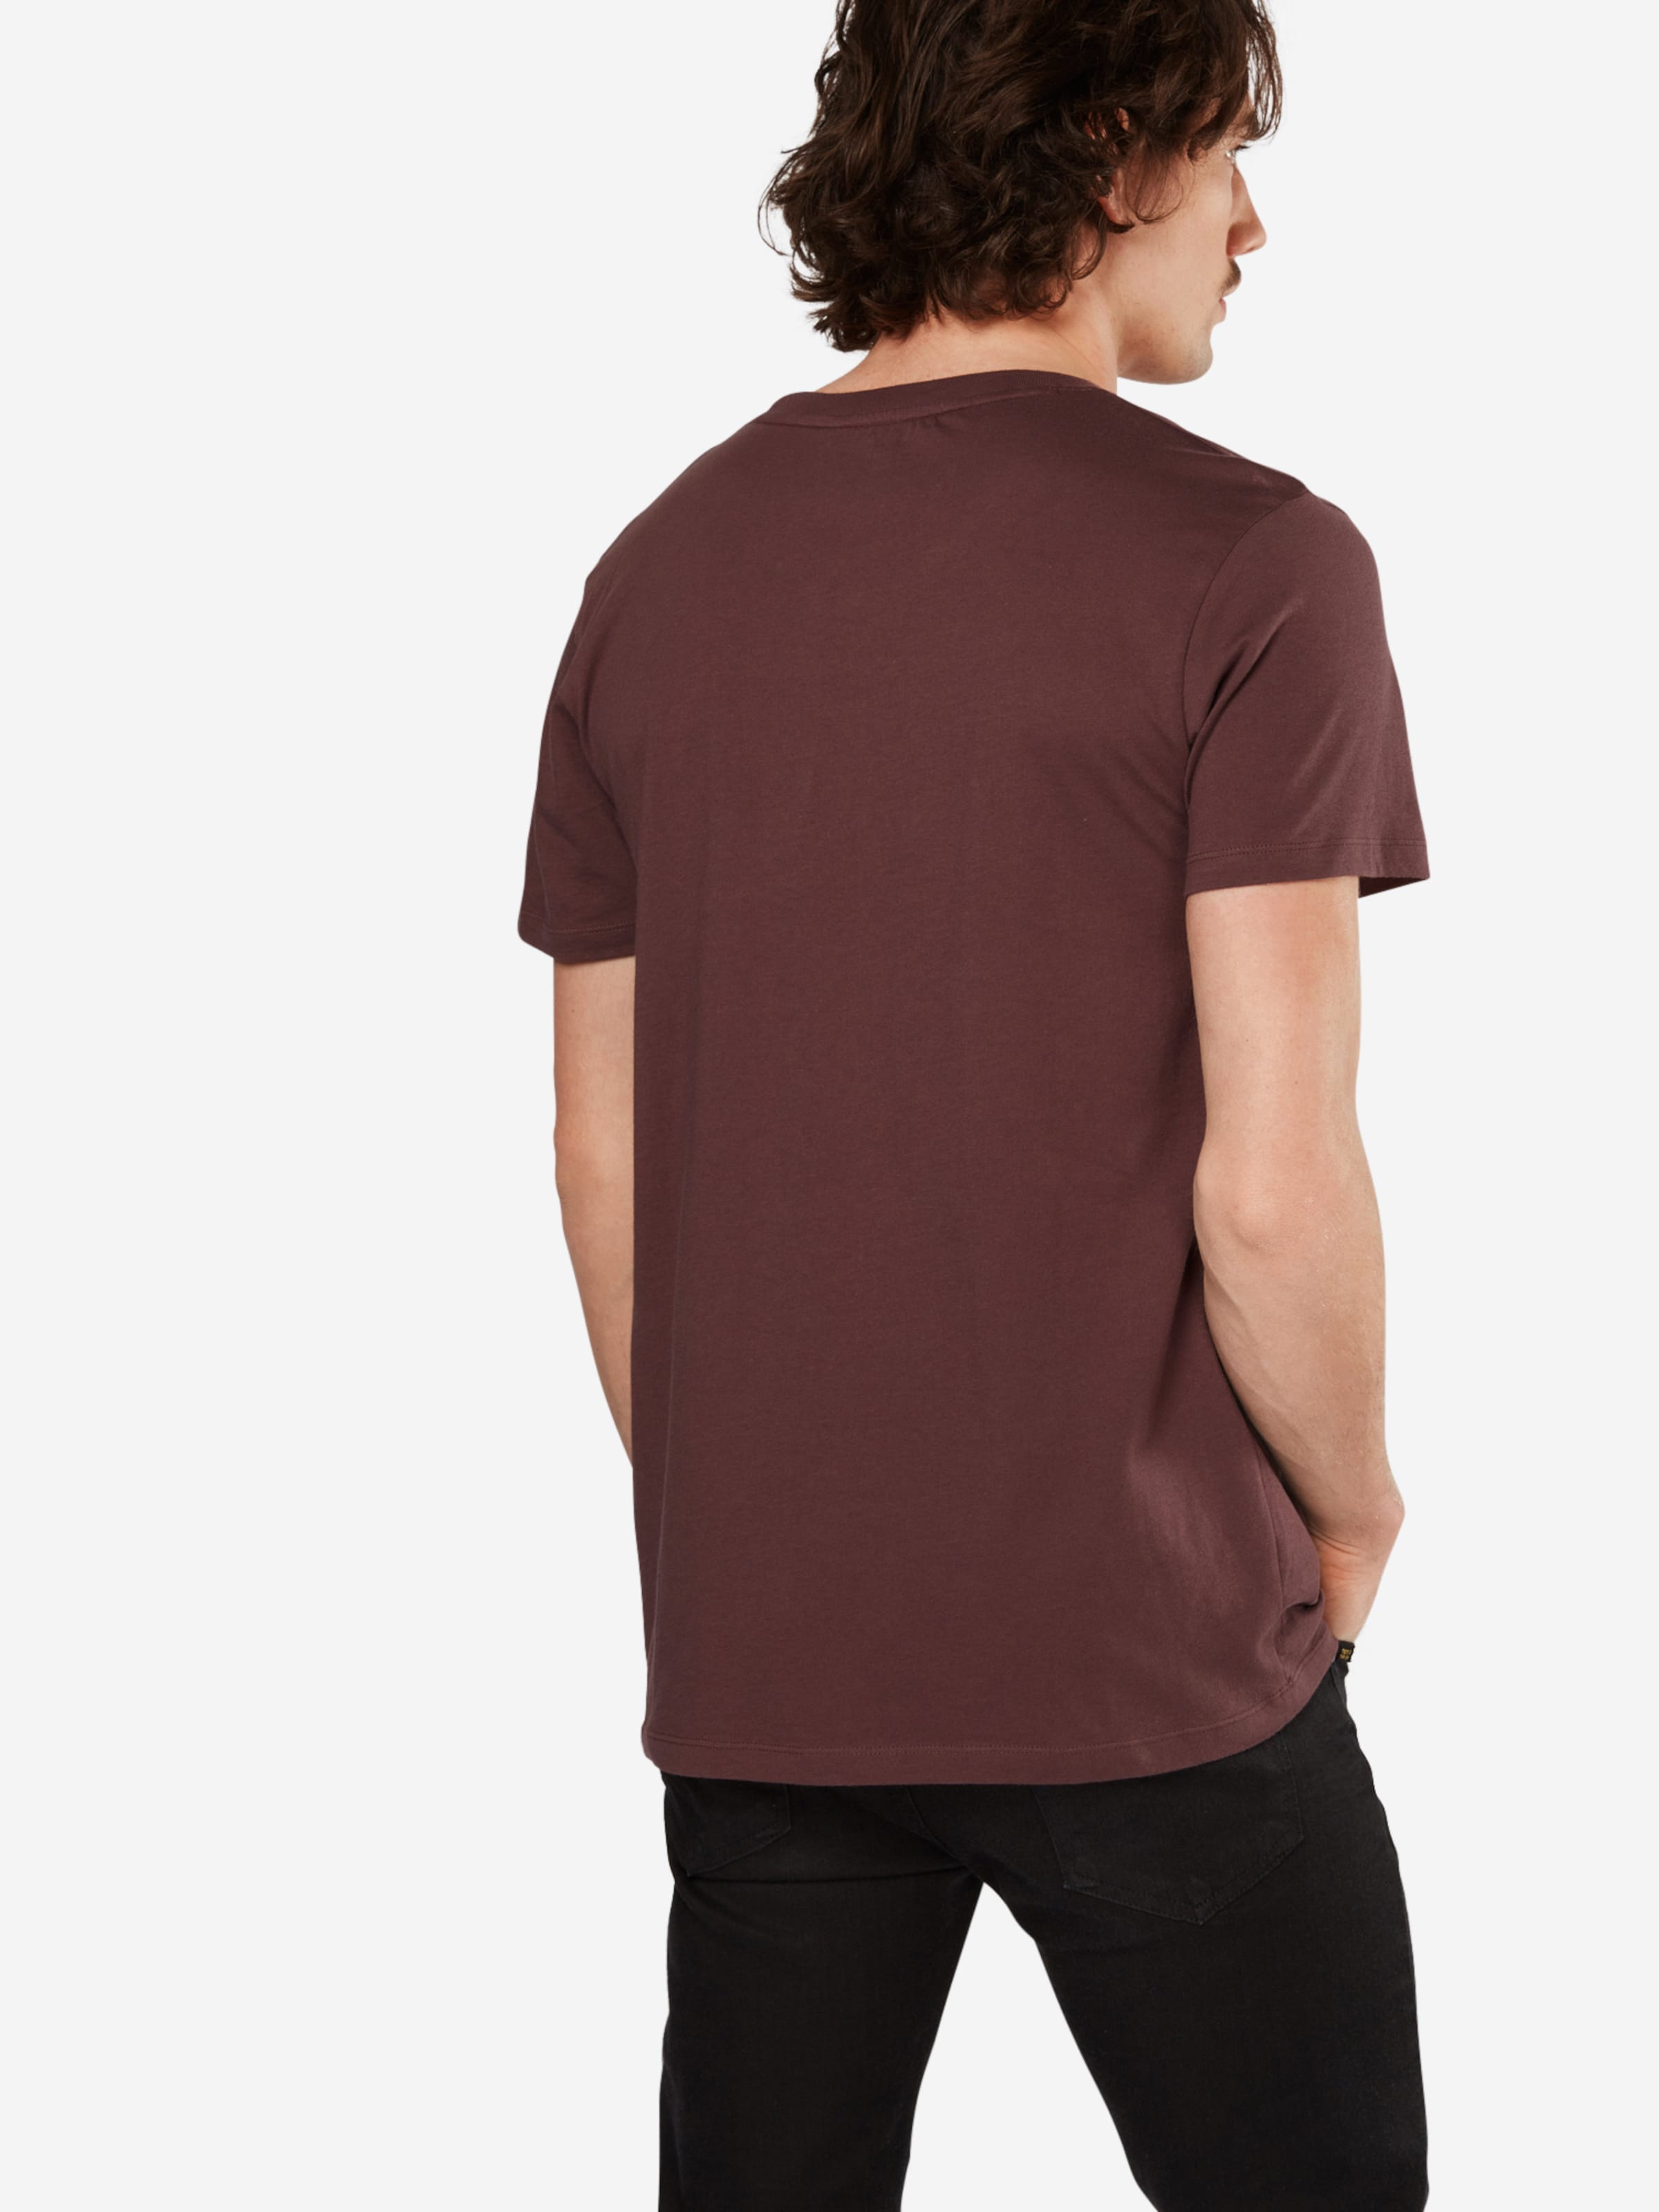 TOM TAILOR DENIM T-Shirt 'Logo D' Zuverlässig Günstig Online F9dw3C